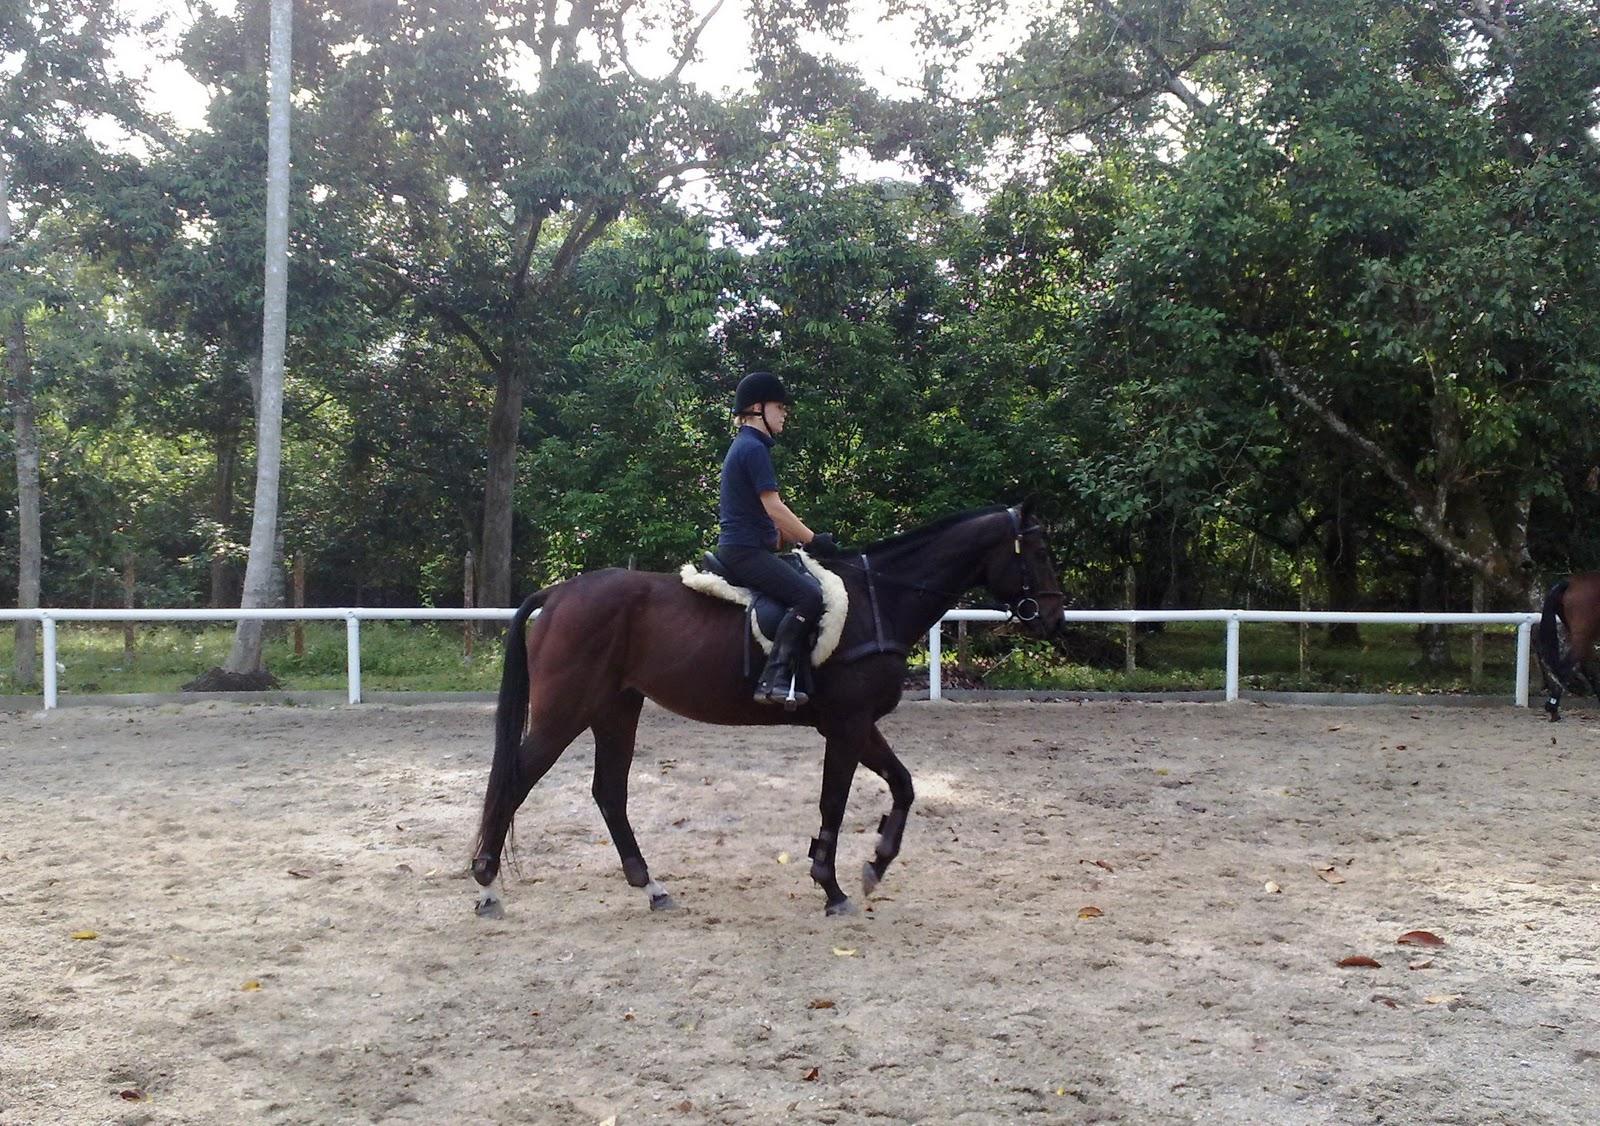 As Equestrian Centre Kelas Menunggang Kuda